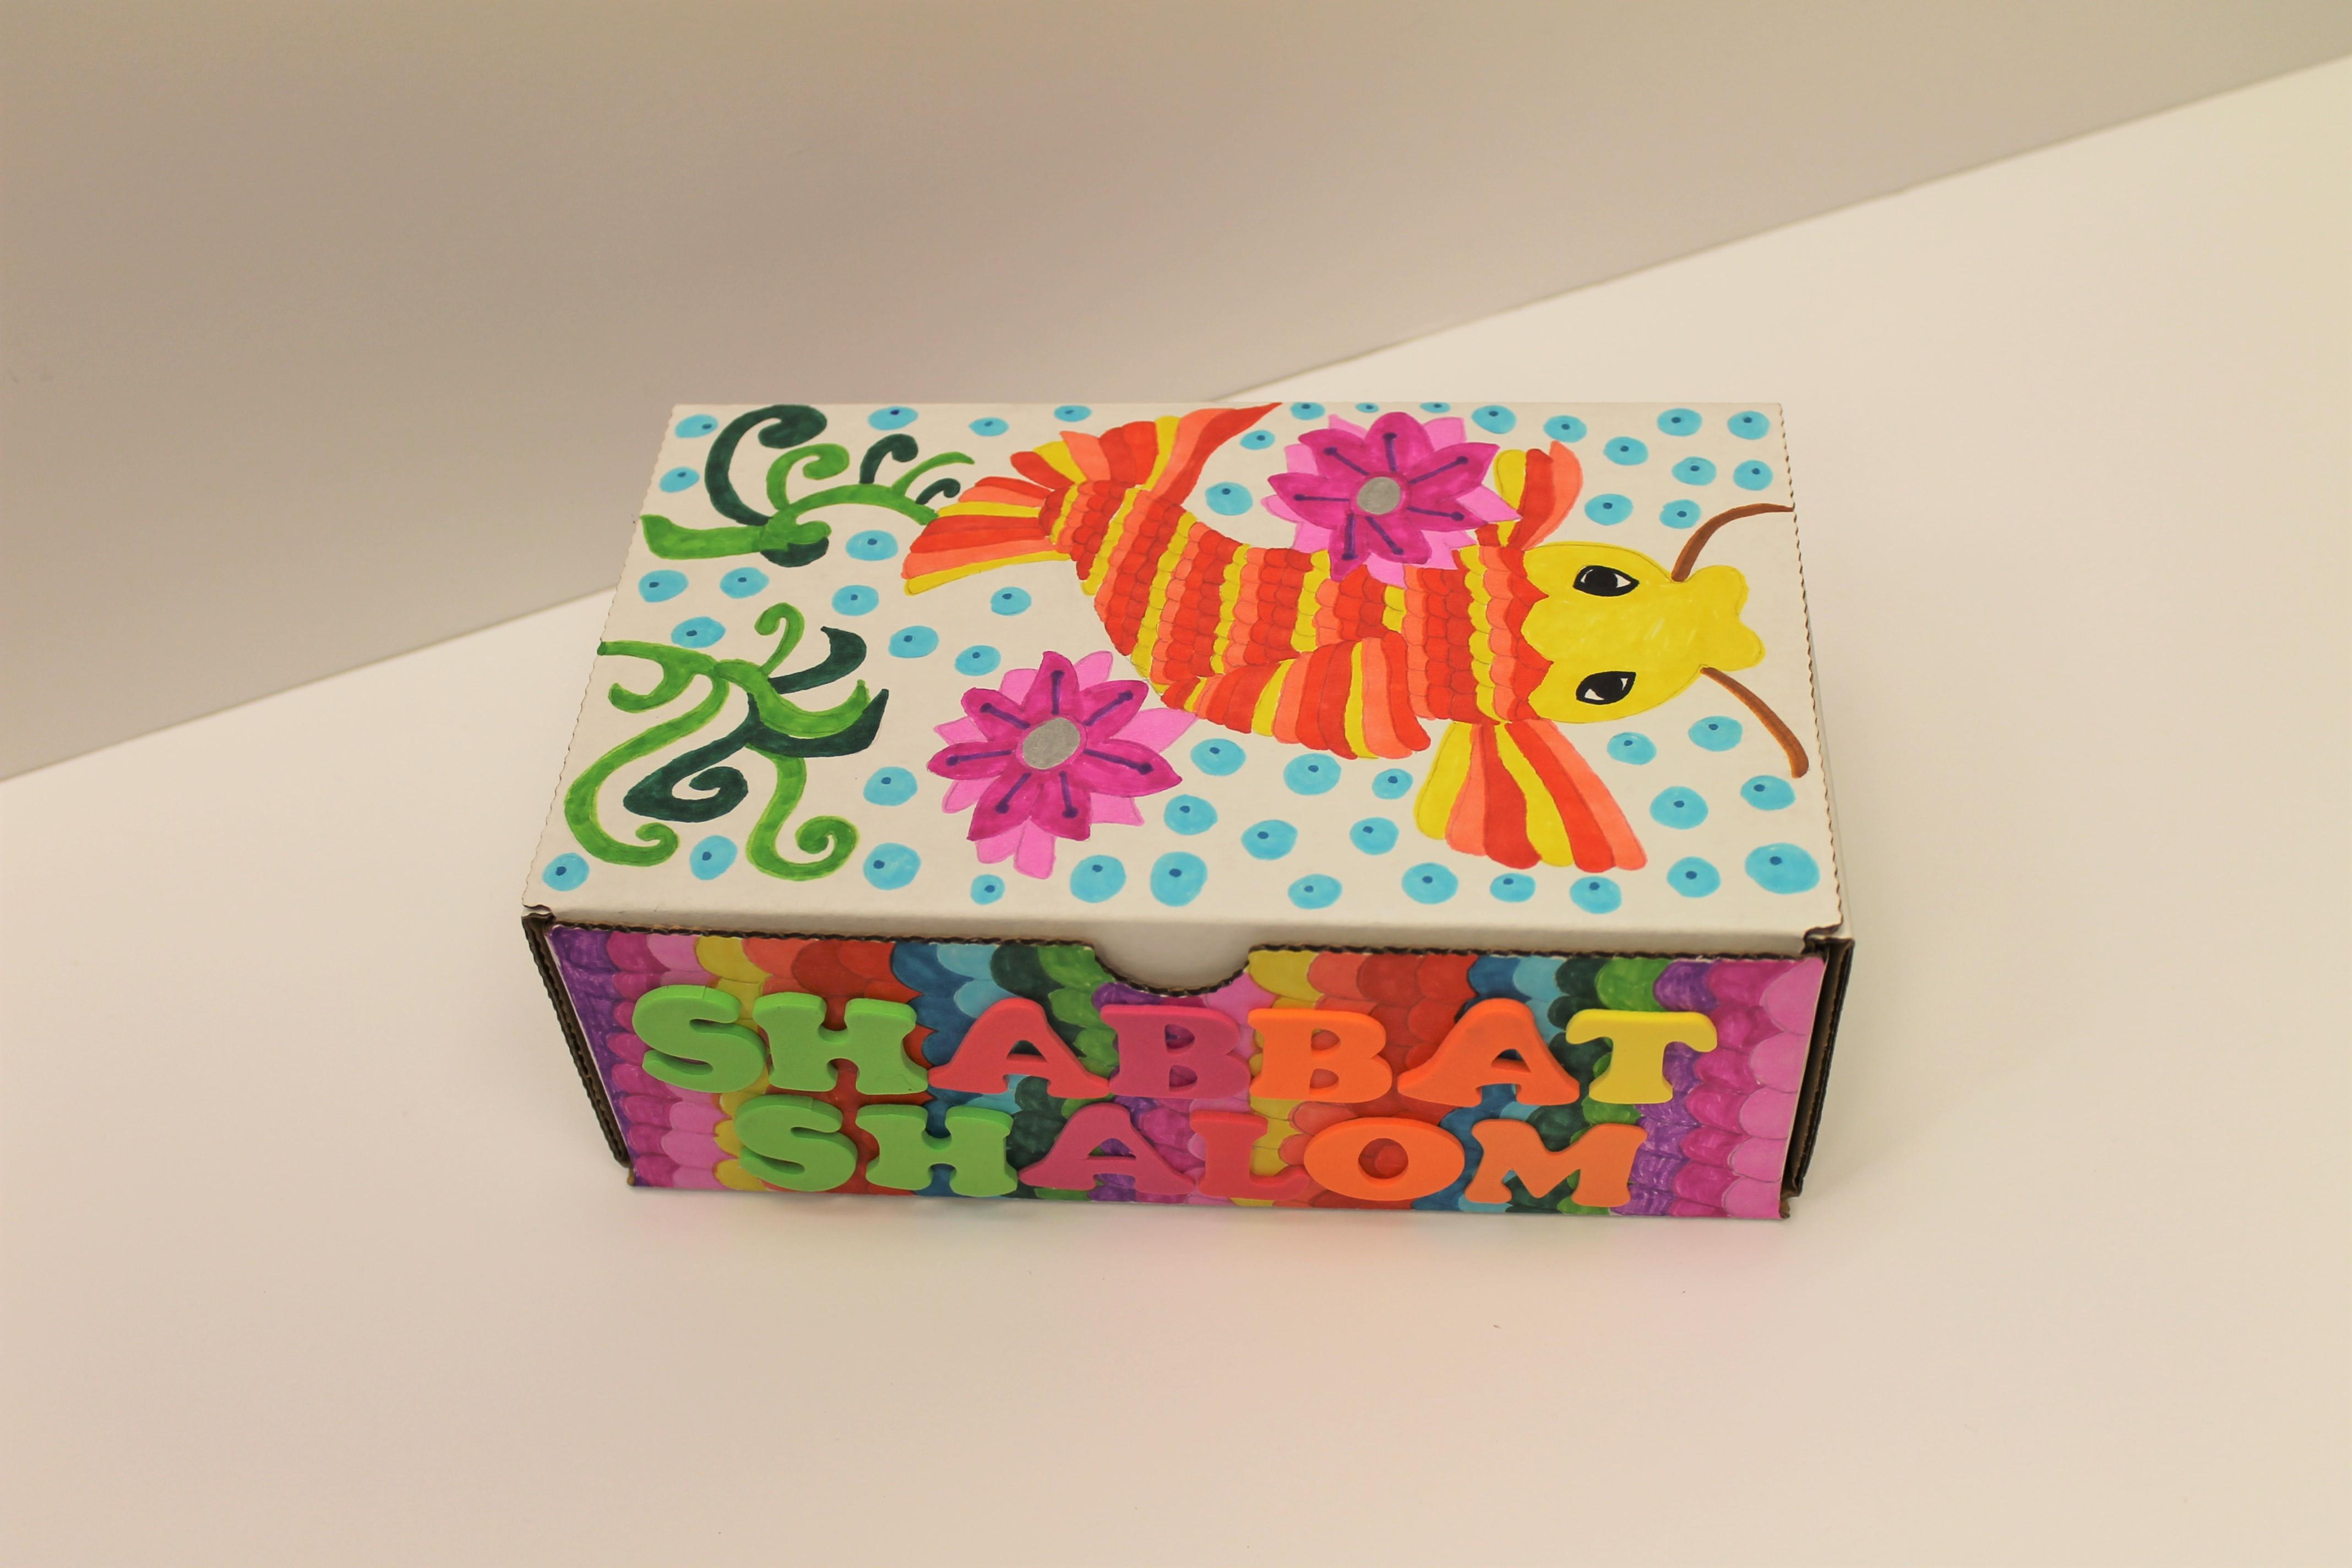 colorful shabbat box with koi fish